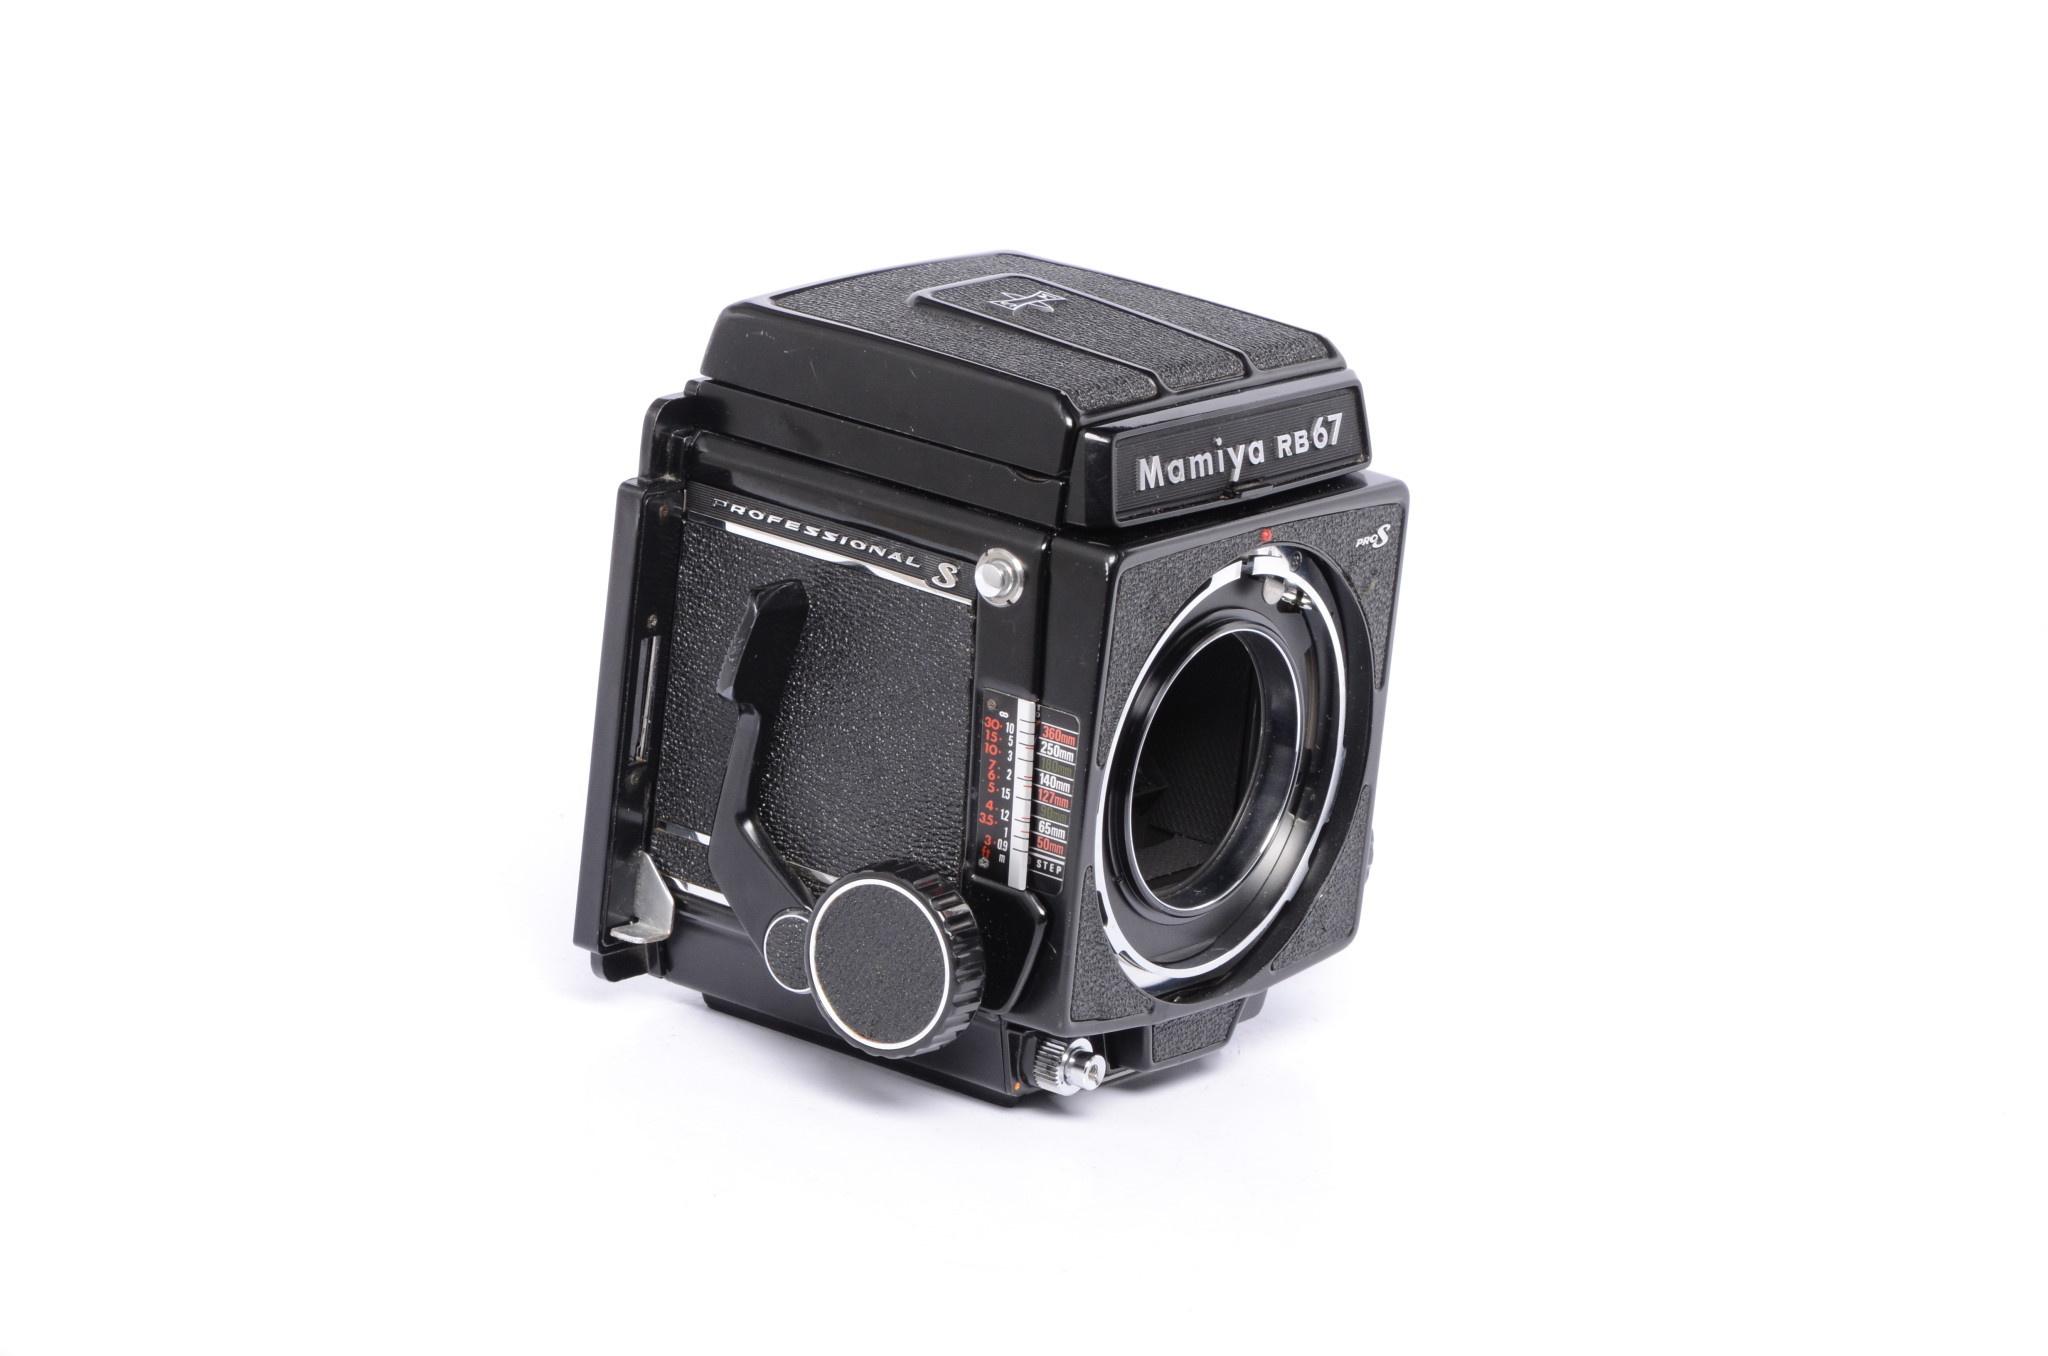 Mamiya Mamiya RB67 Pro S w/ WL Waist Level Finder and P Adapter SN: C227867 *